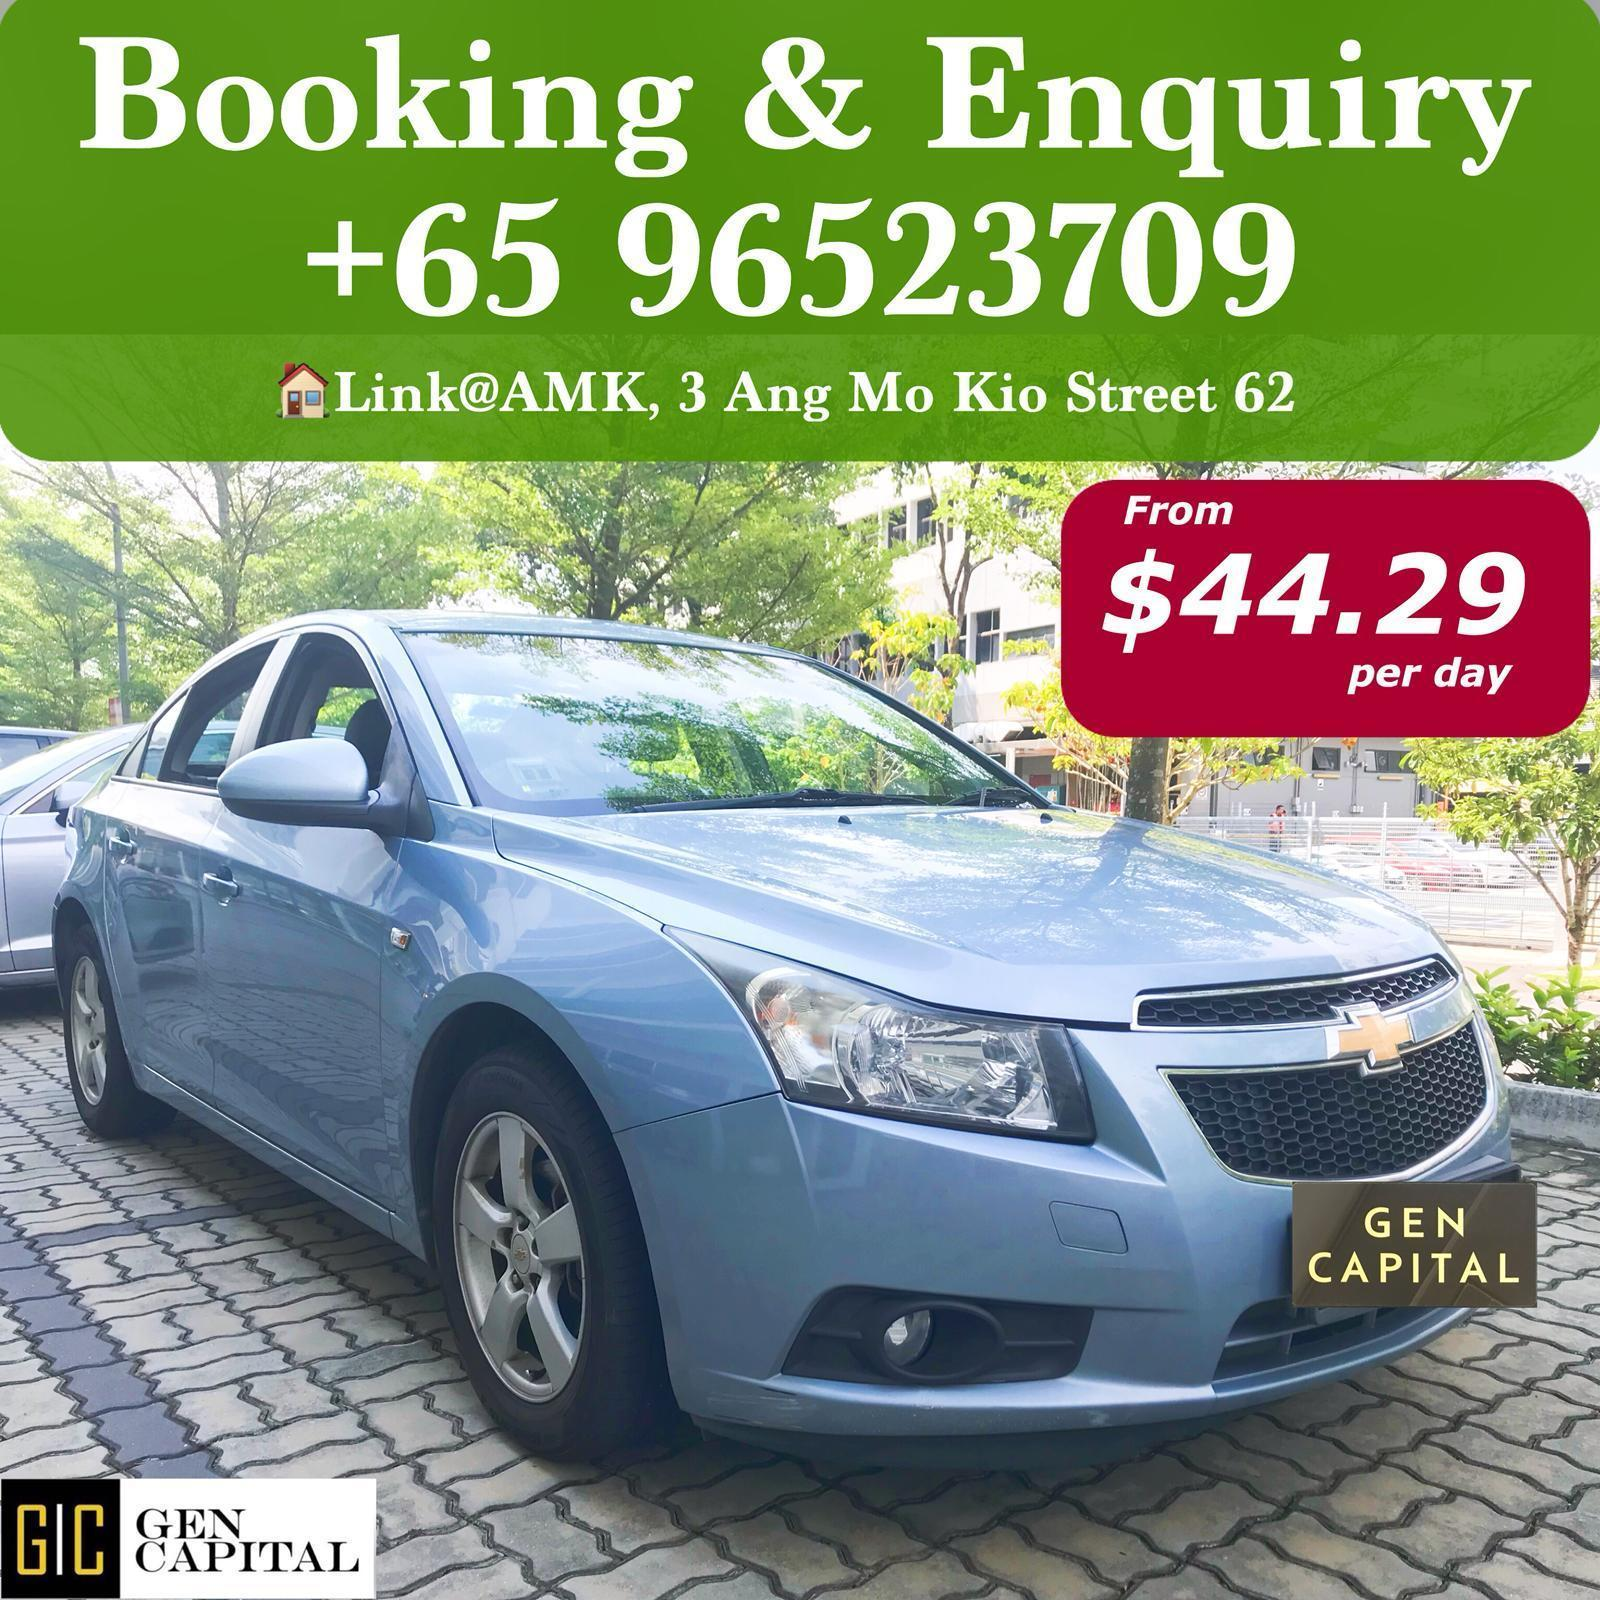 Limited!! [Hari Raya Available] Chevrolet Cruze 1.6A Classy Drive